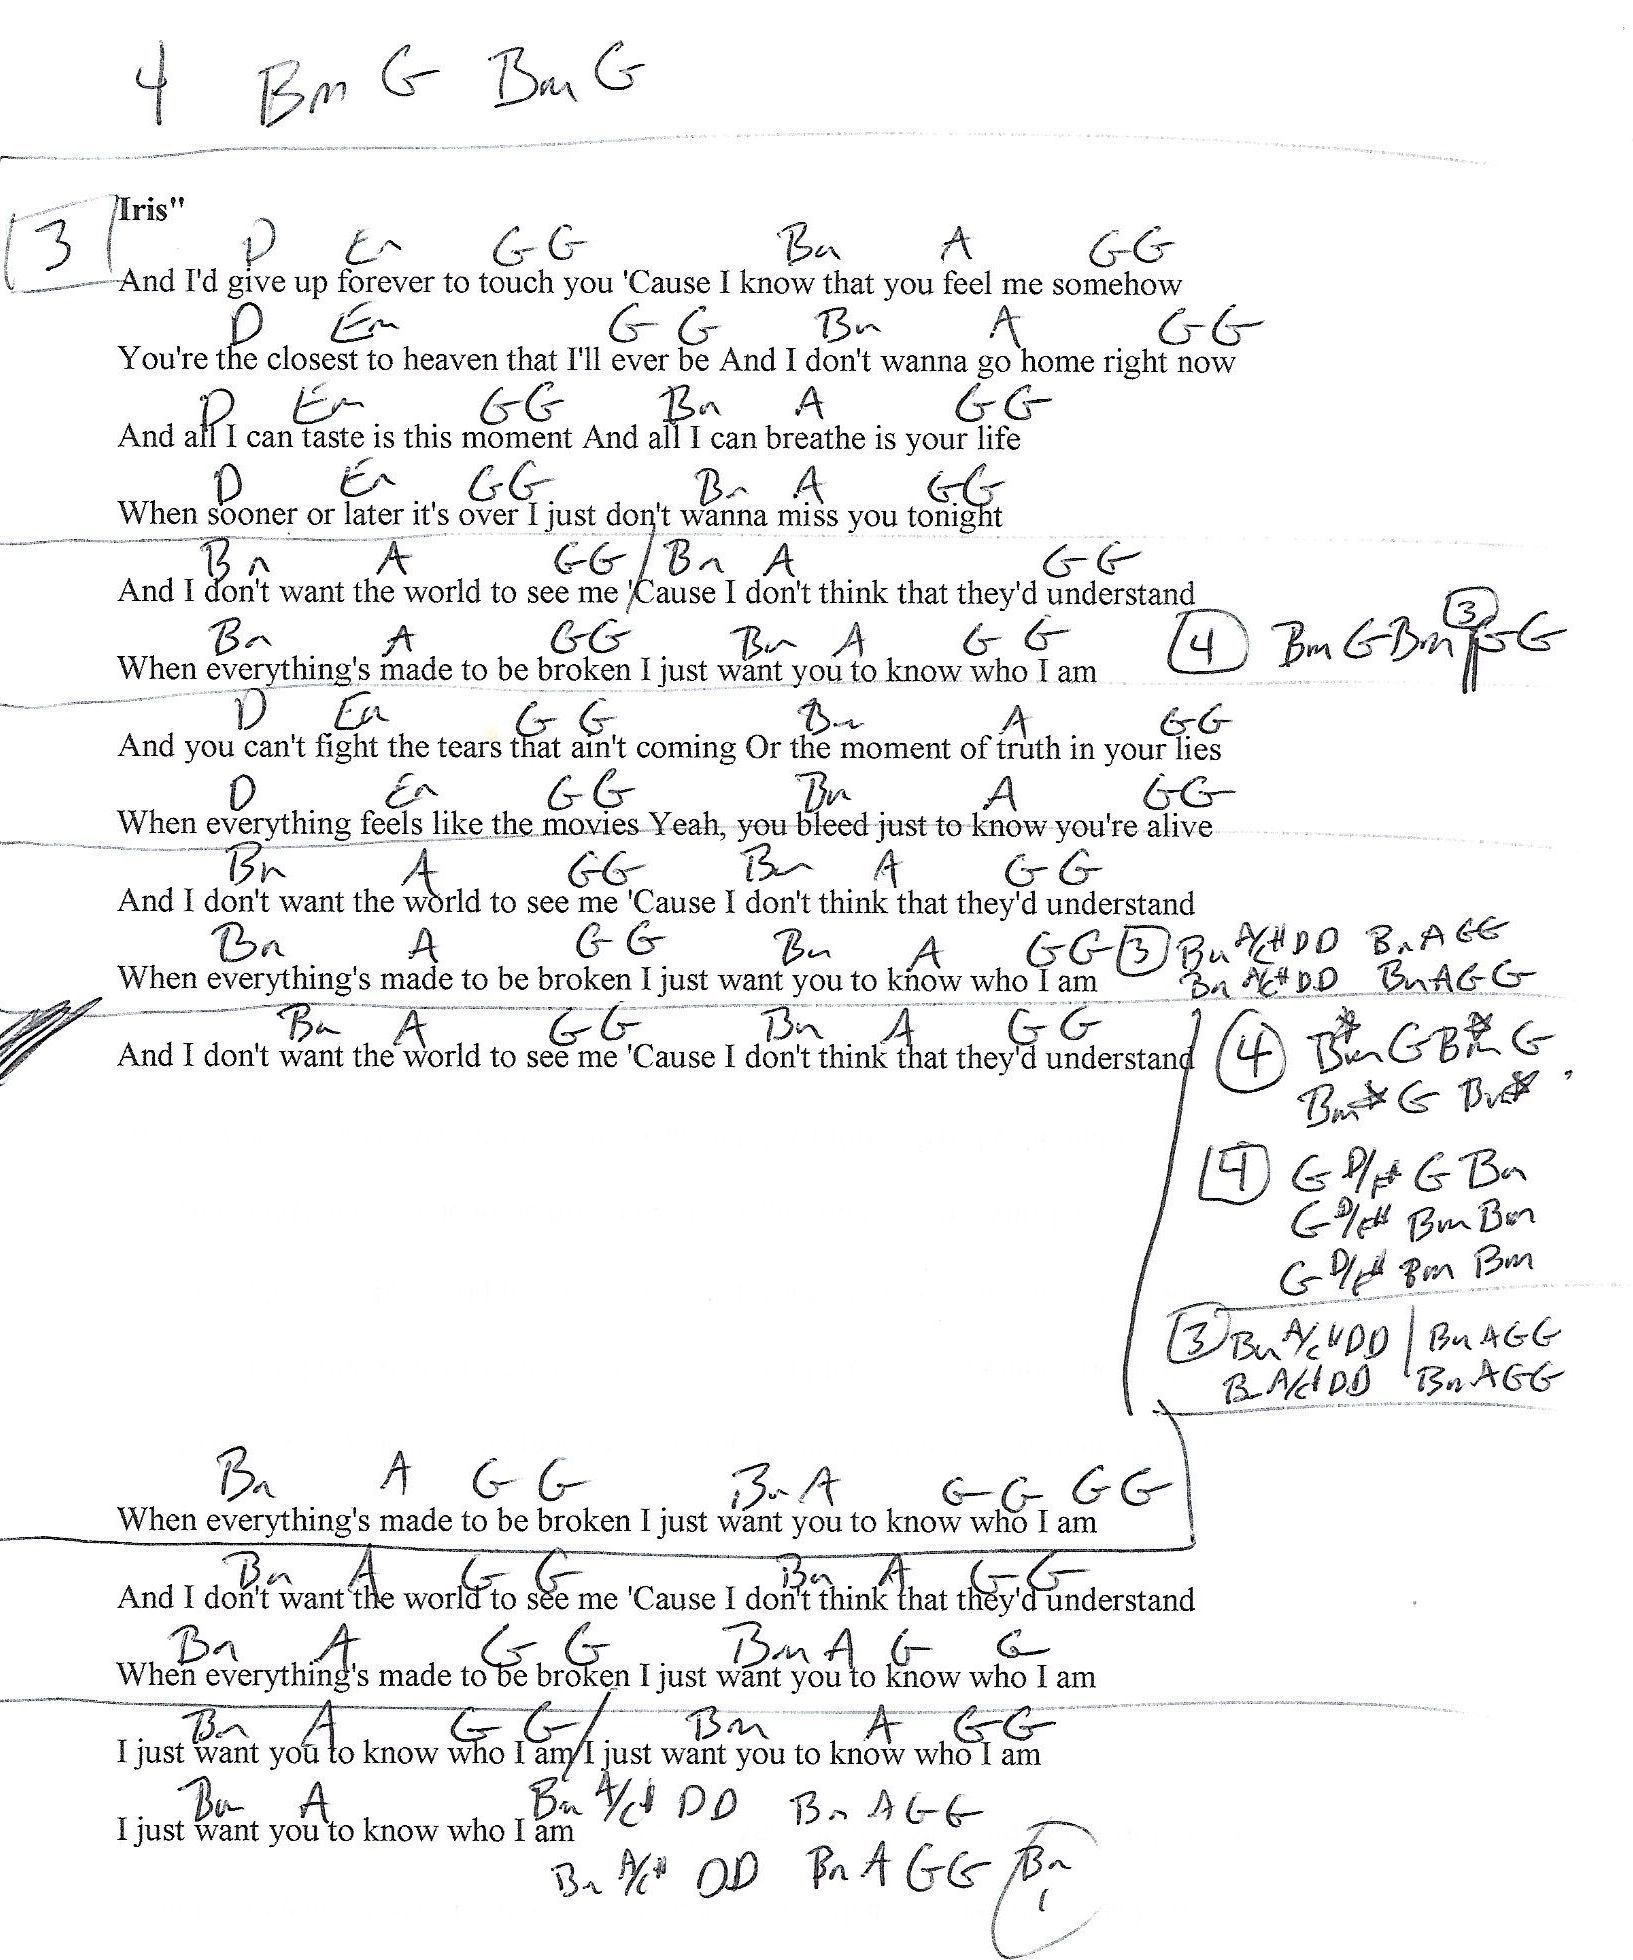 Iris goo goo dolls guitar lesson chord chart with lyrics iris goo goo dolls guitar lesson chord chart with lyrics hexwebz Image collections